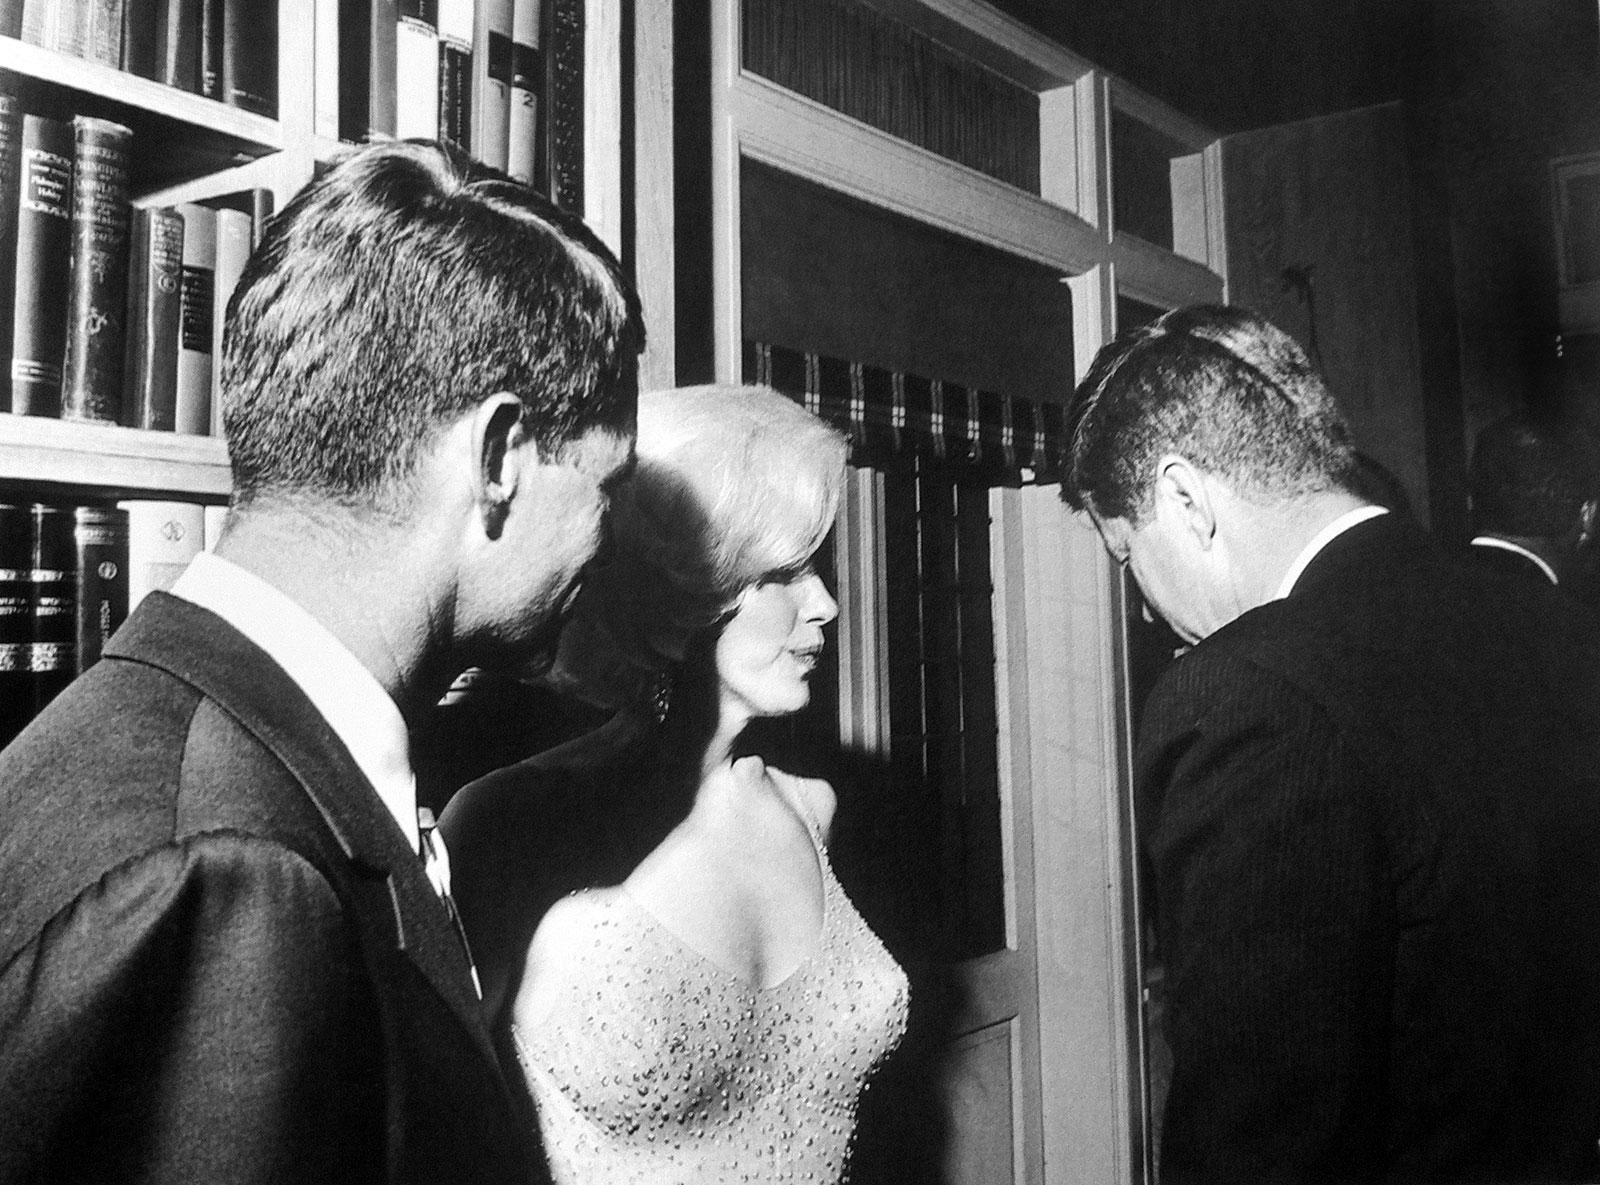 http://4.bp.blogspot.com/_04kZGR_ltmE/TTLLenHVpRI/AAAAAAAAI-Q/u6PTm8ki9m4/s1600/President-Kennedy-and-Marilyn-Monroe.jpg